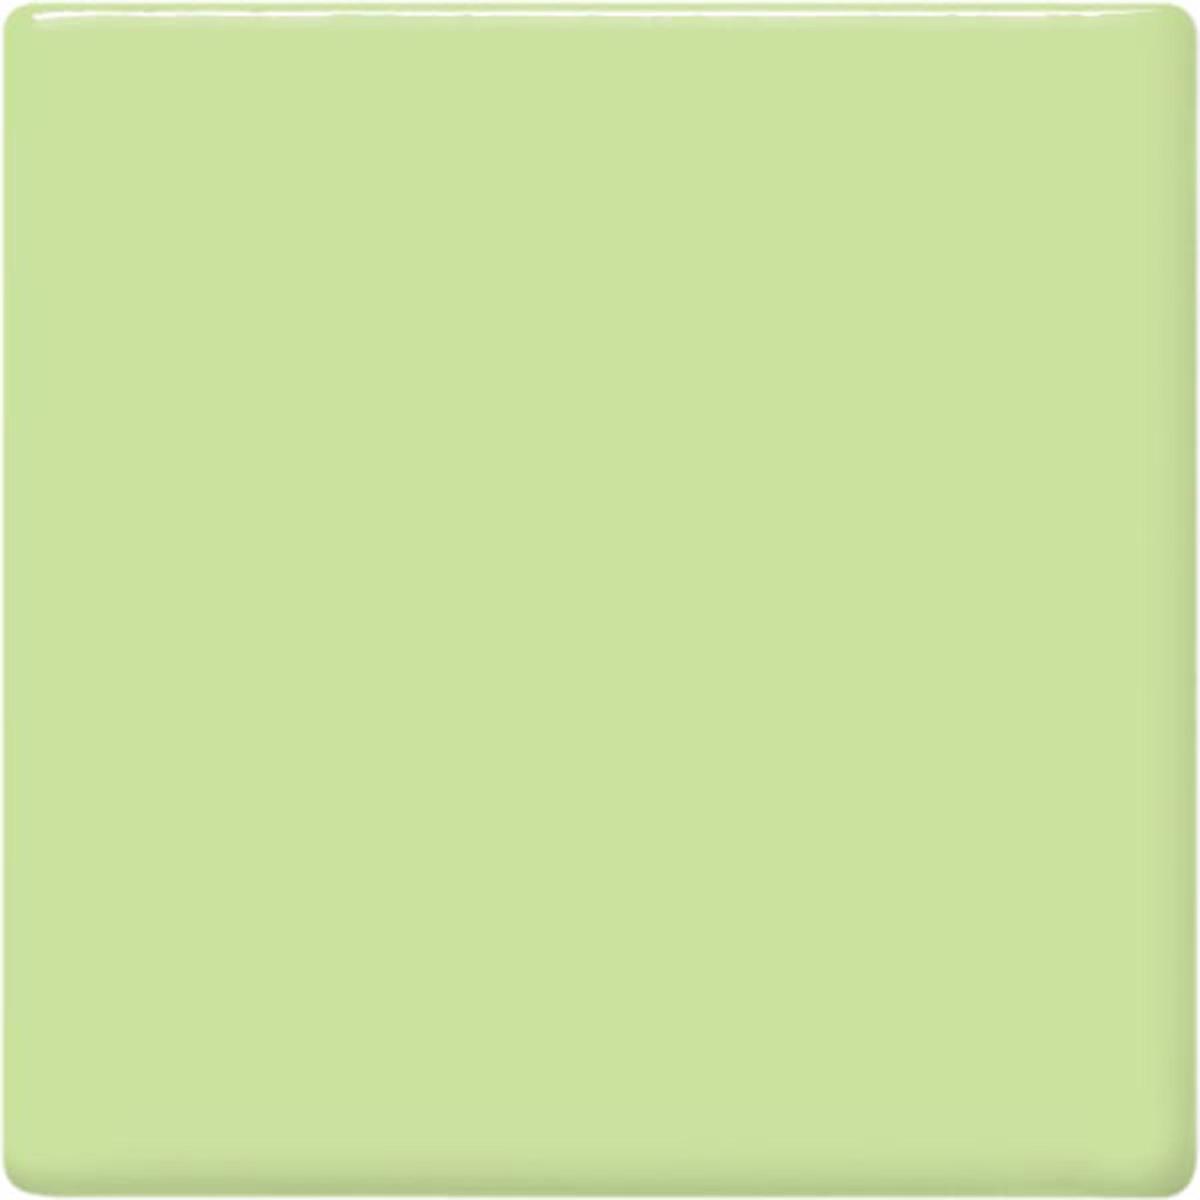 venta de esmalte para cerámica amaco teachers palette Tp-40 mint green baja temperatura